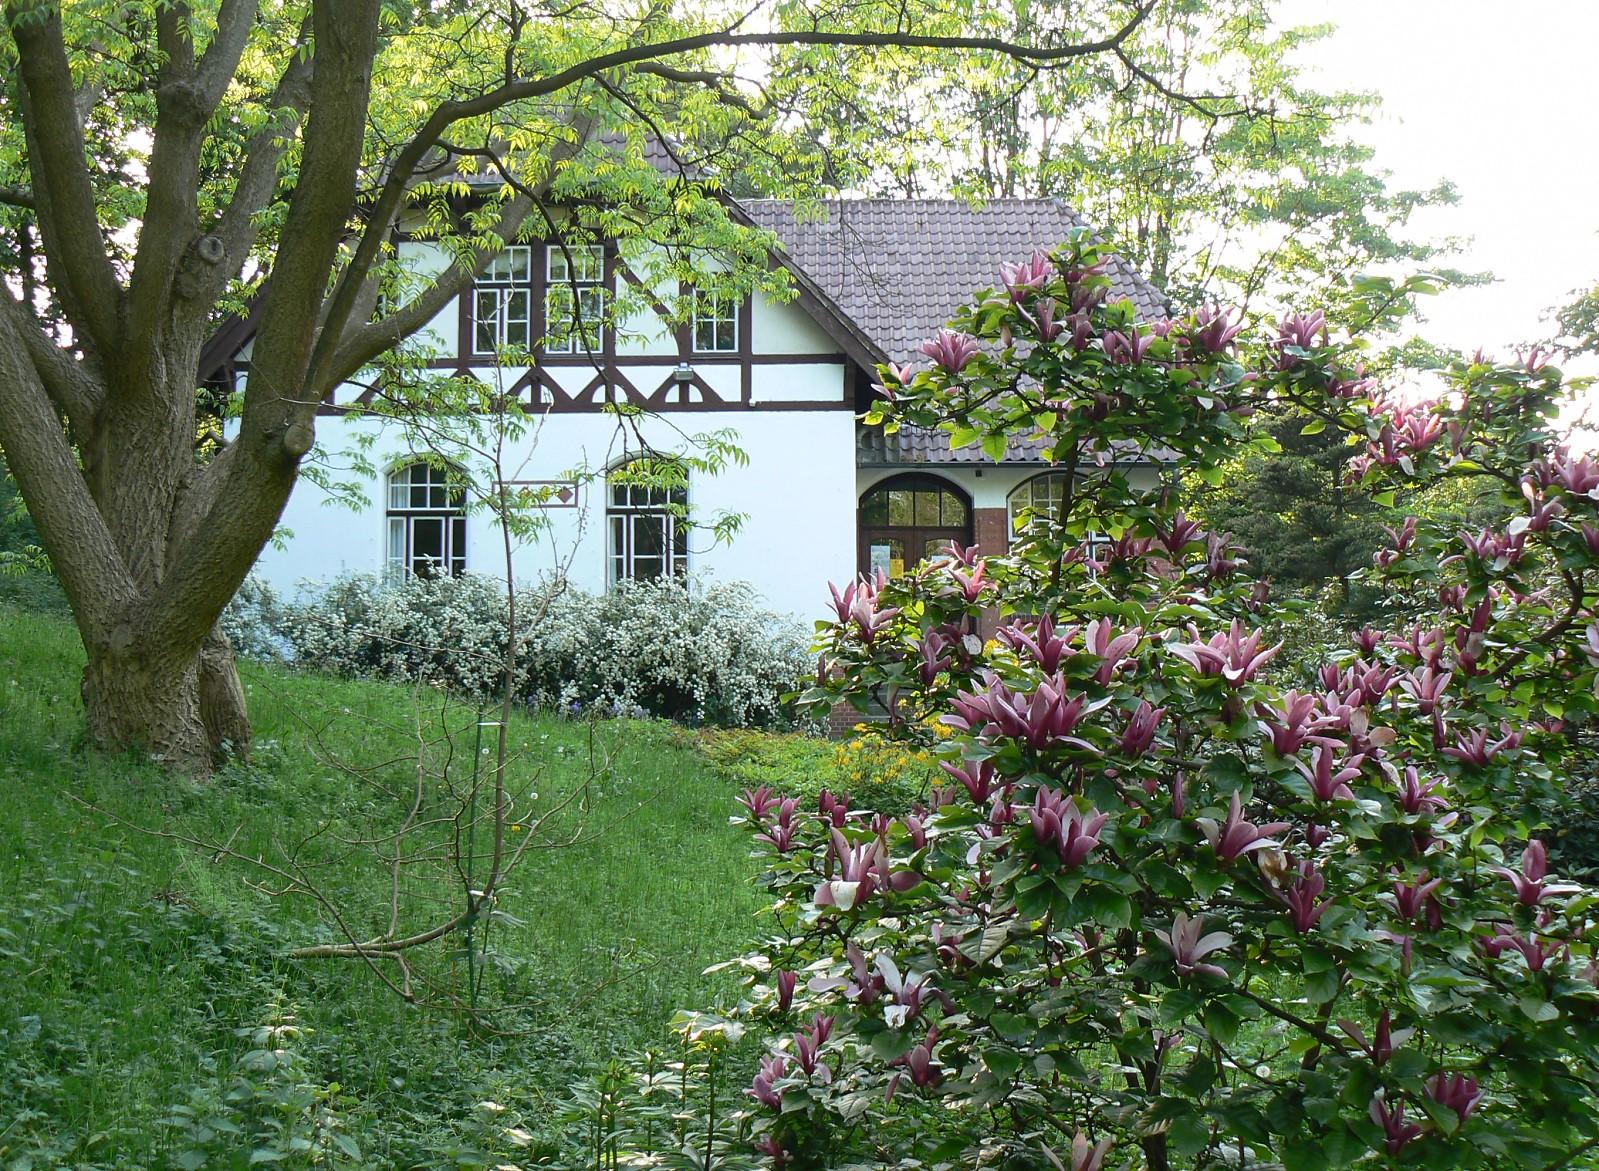 File:Alter Botanischer Garten Kiel Literaturhaus.jpg